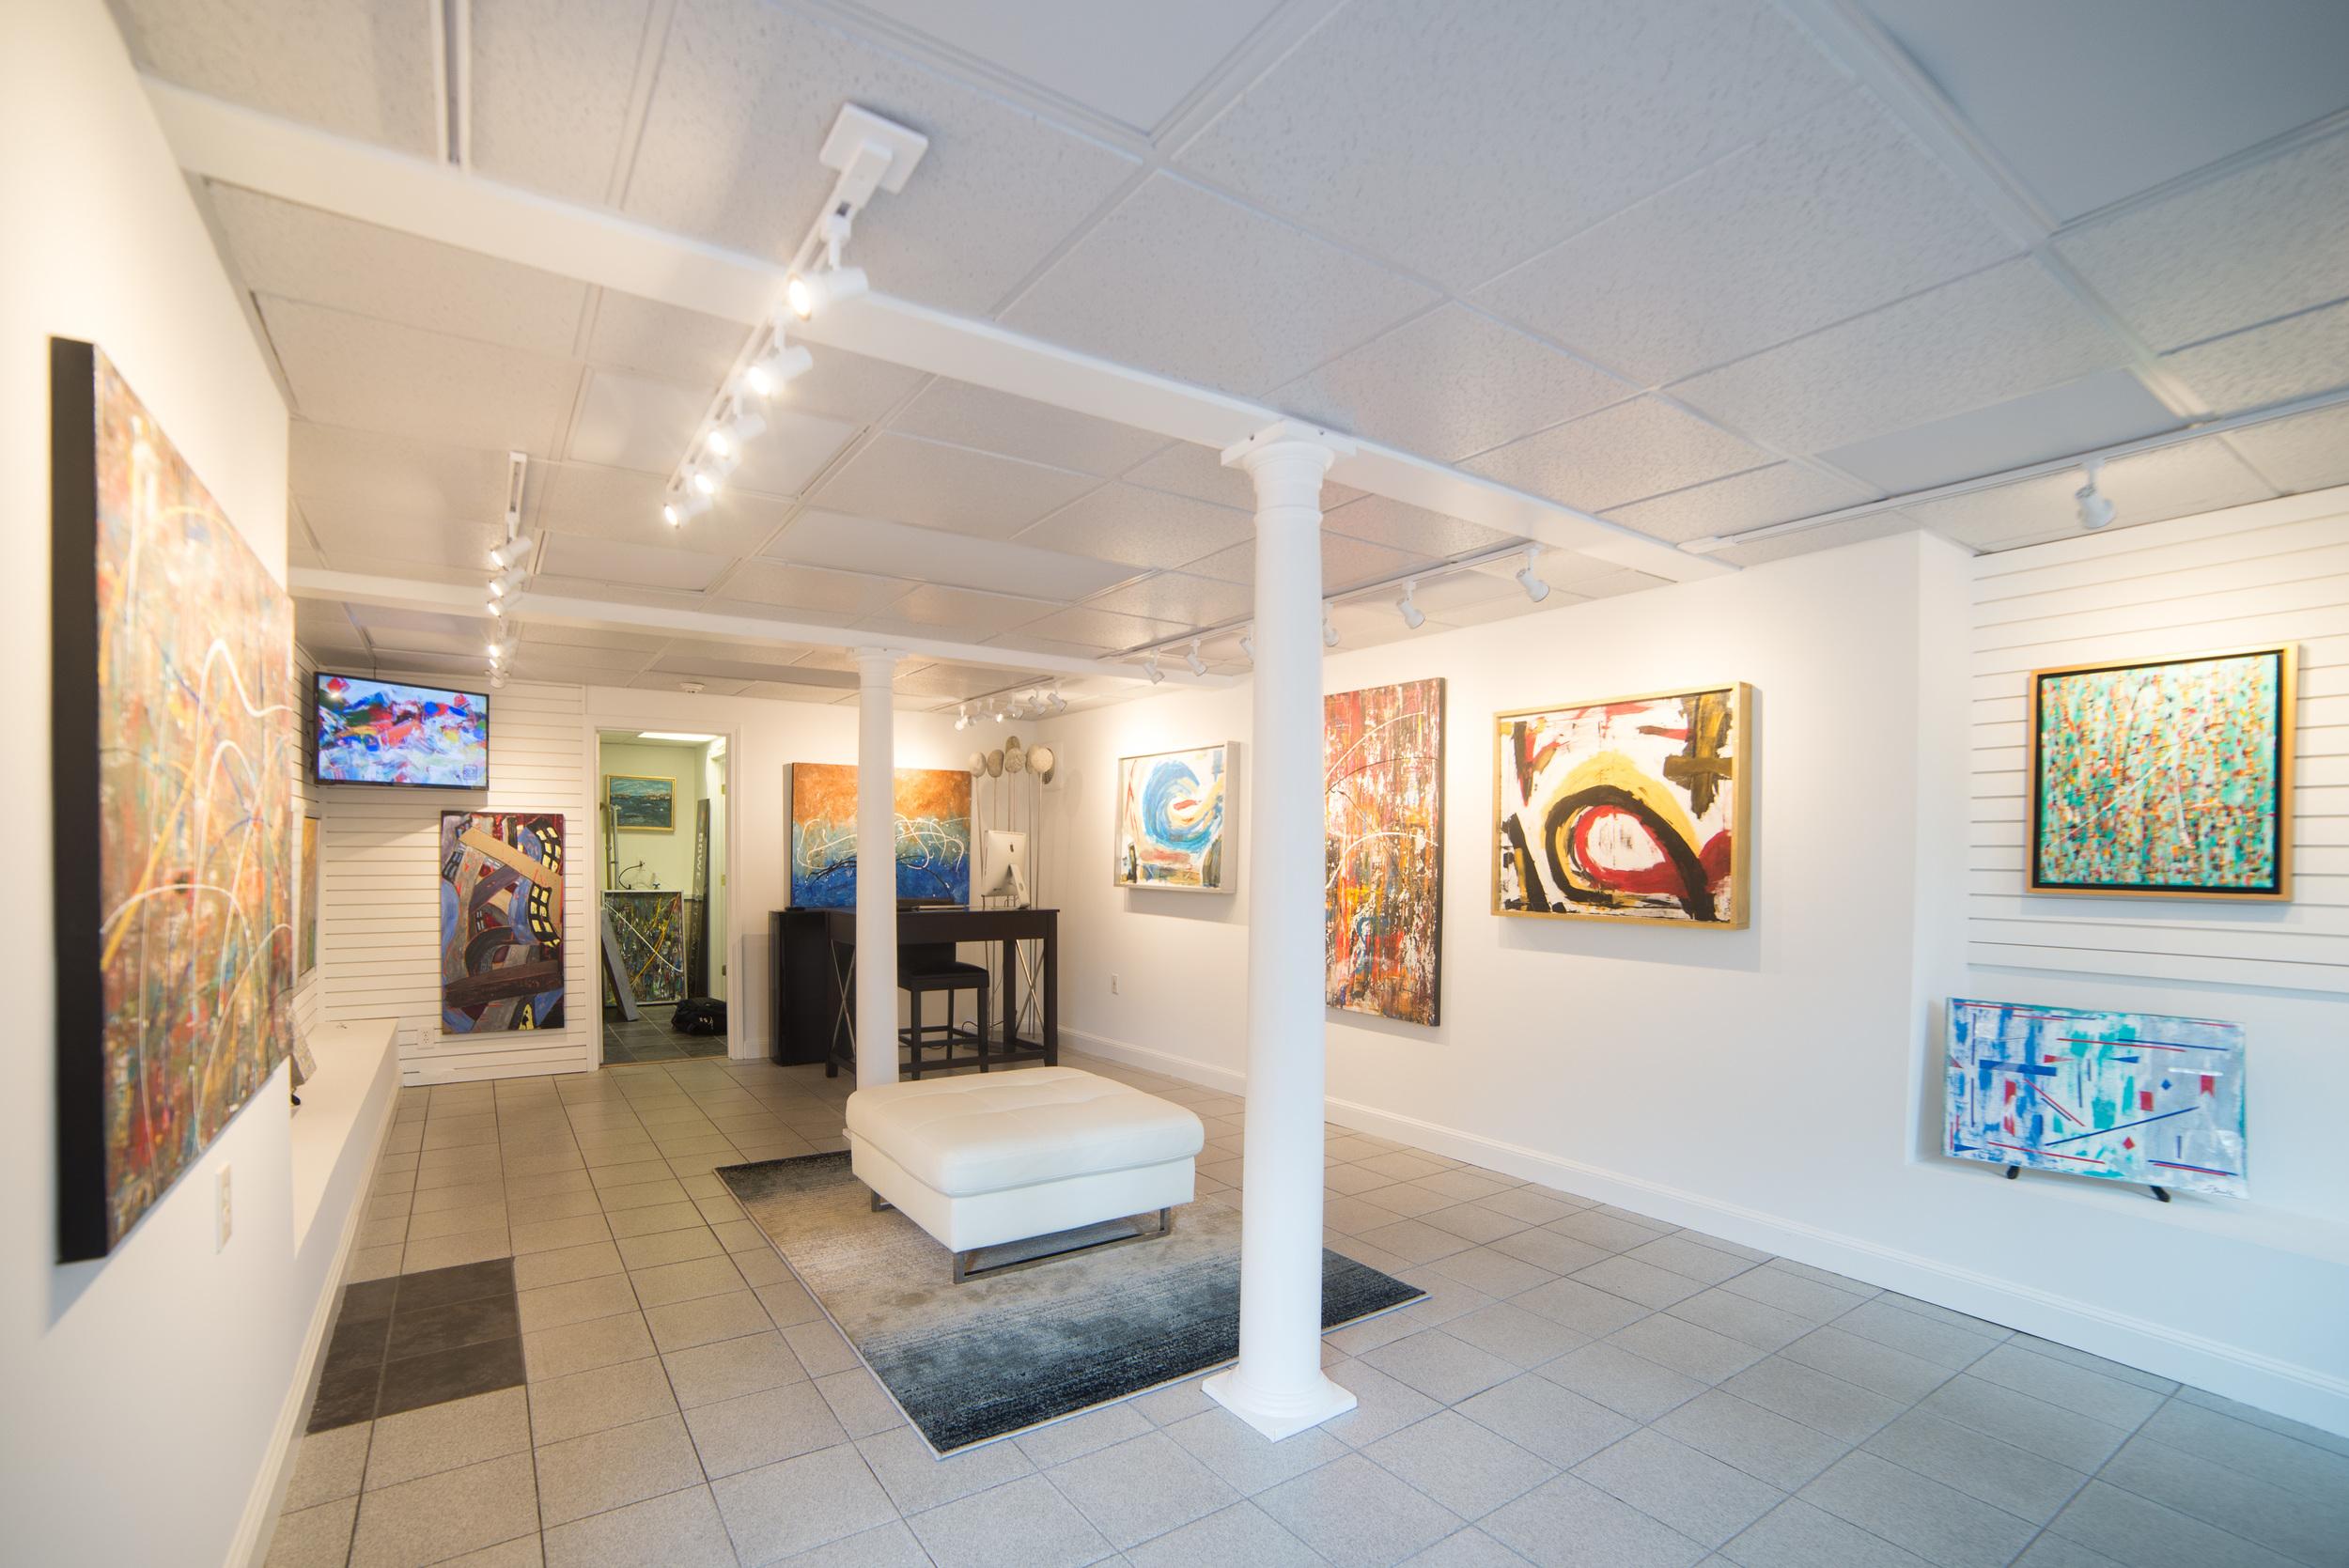 June_2016_Portland_Maine_20160627-DSC_6695 By Corey Templeton Bowe Art Gallery Freeport ME - Large.jpg